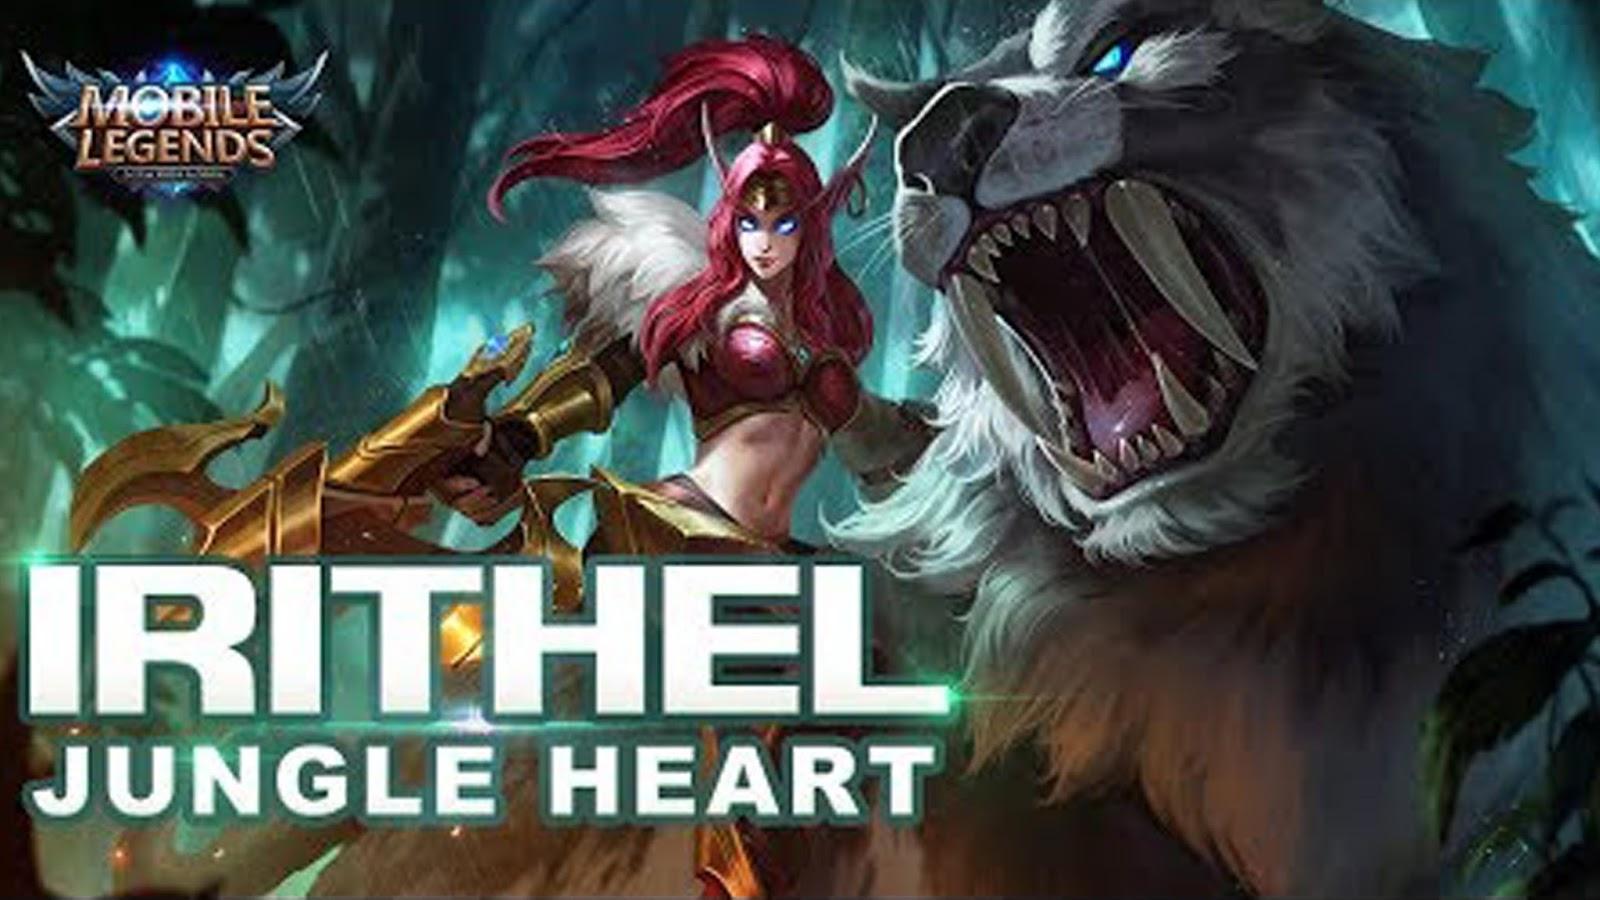 Irithel the Jungle Heart